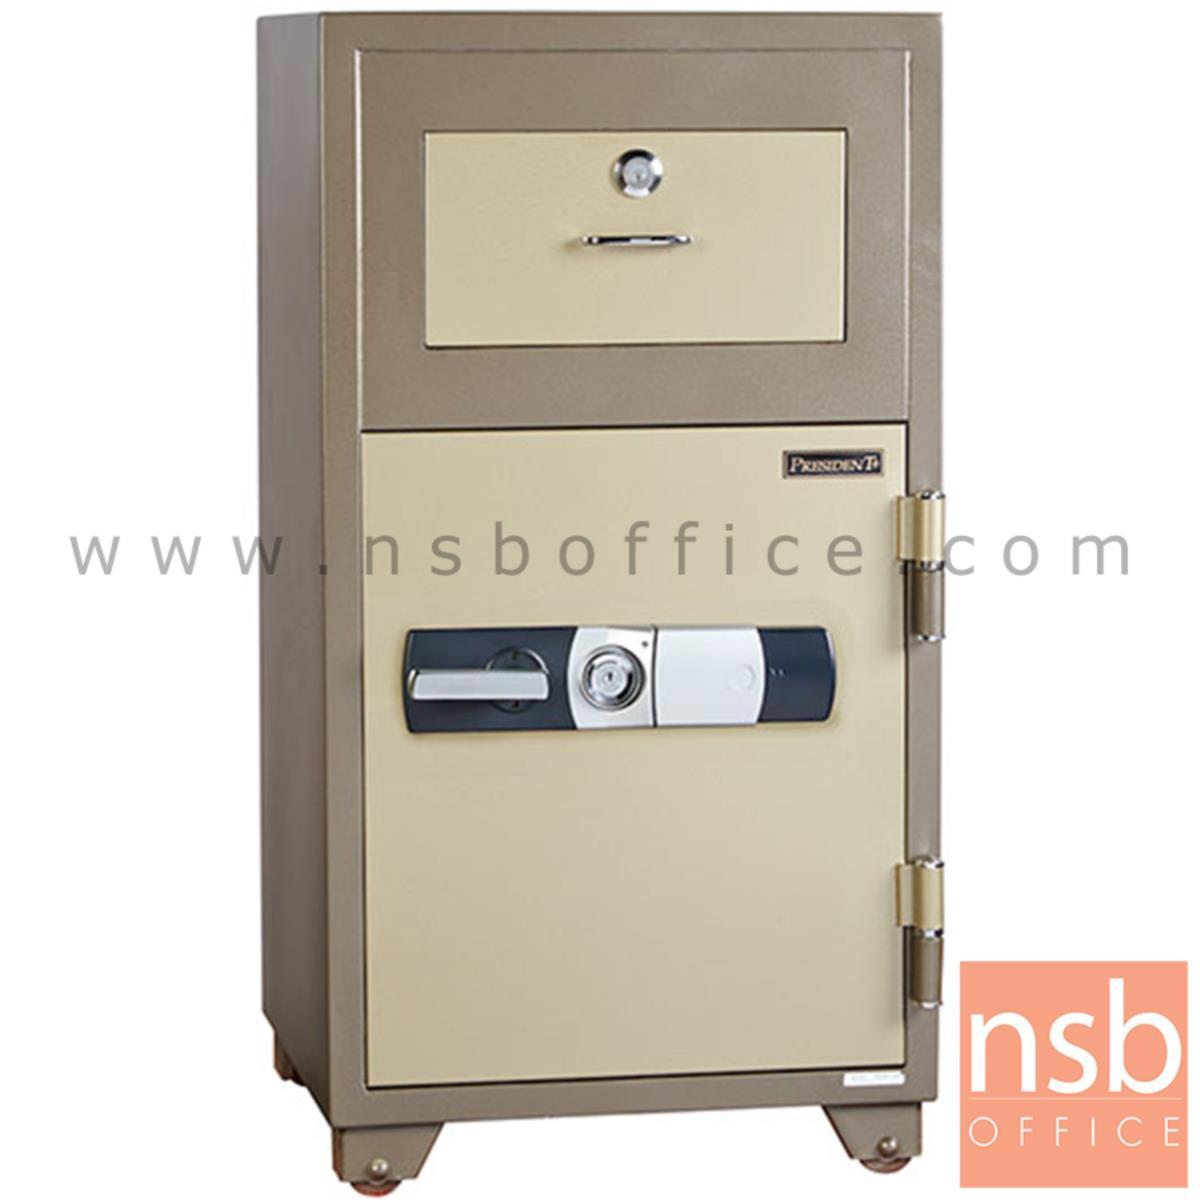 F05A076:ตู้เซฟนิรภัยชนิดดิจิตอล รุ่น PRESIDENT-ND-200D  มี 2 กุญแจ 1 รหัส (รหัสใช้กดหน้าตู้)